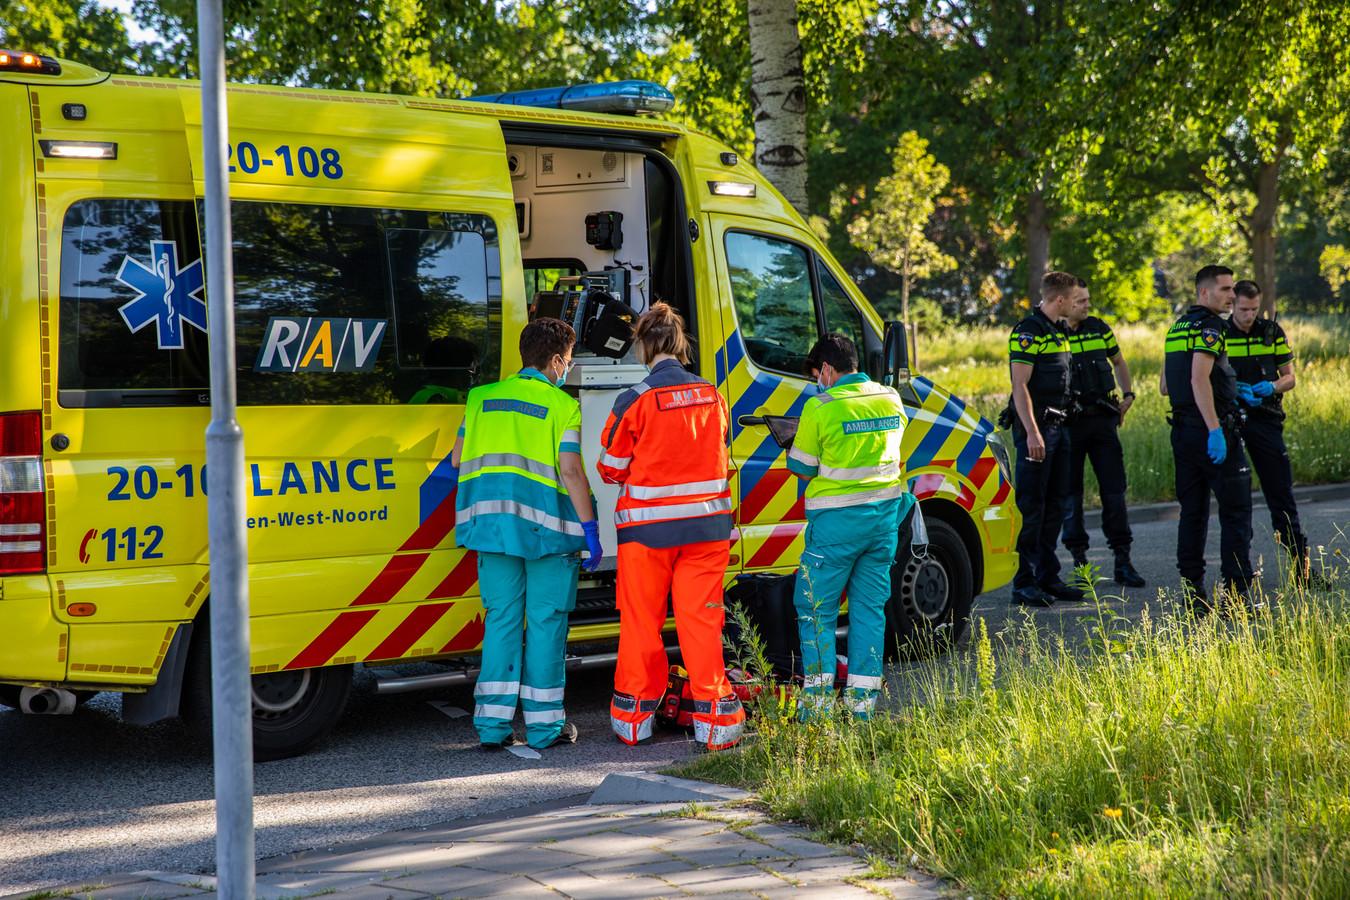 Fietser zwaargewond na ongeluk met auto op kruising in Roosendaal.